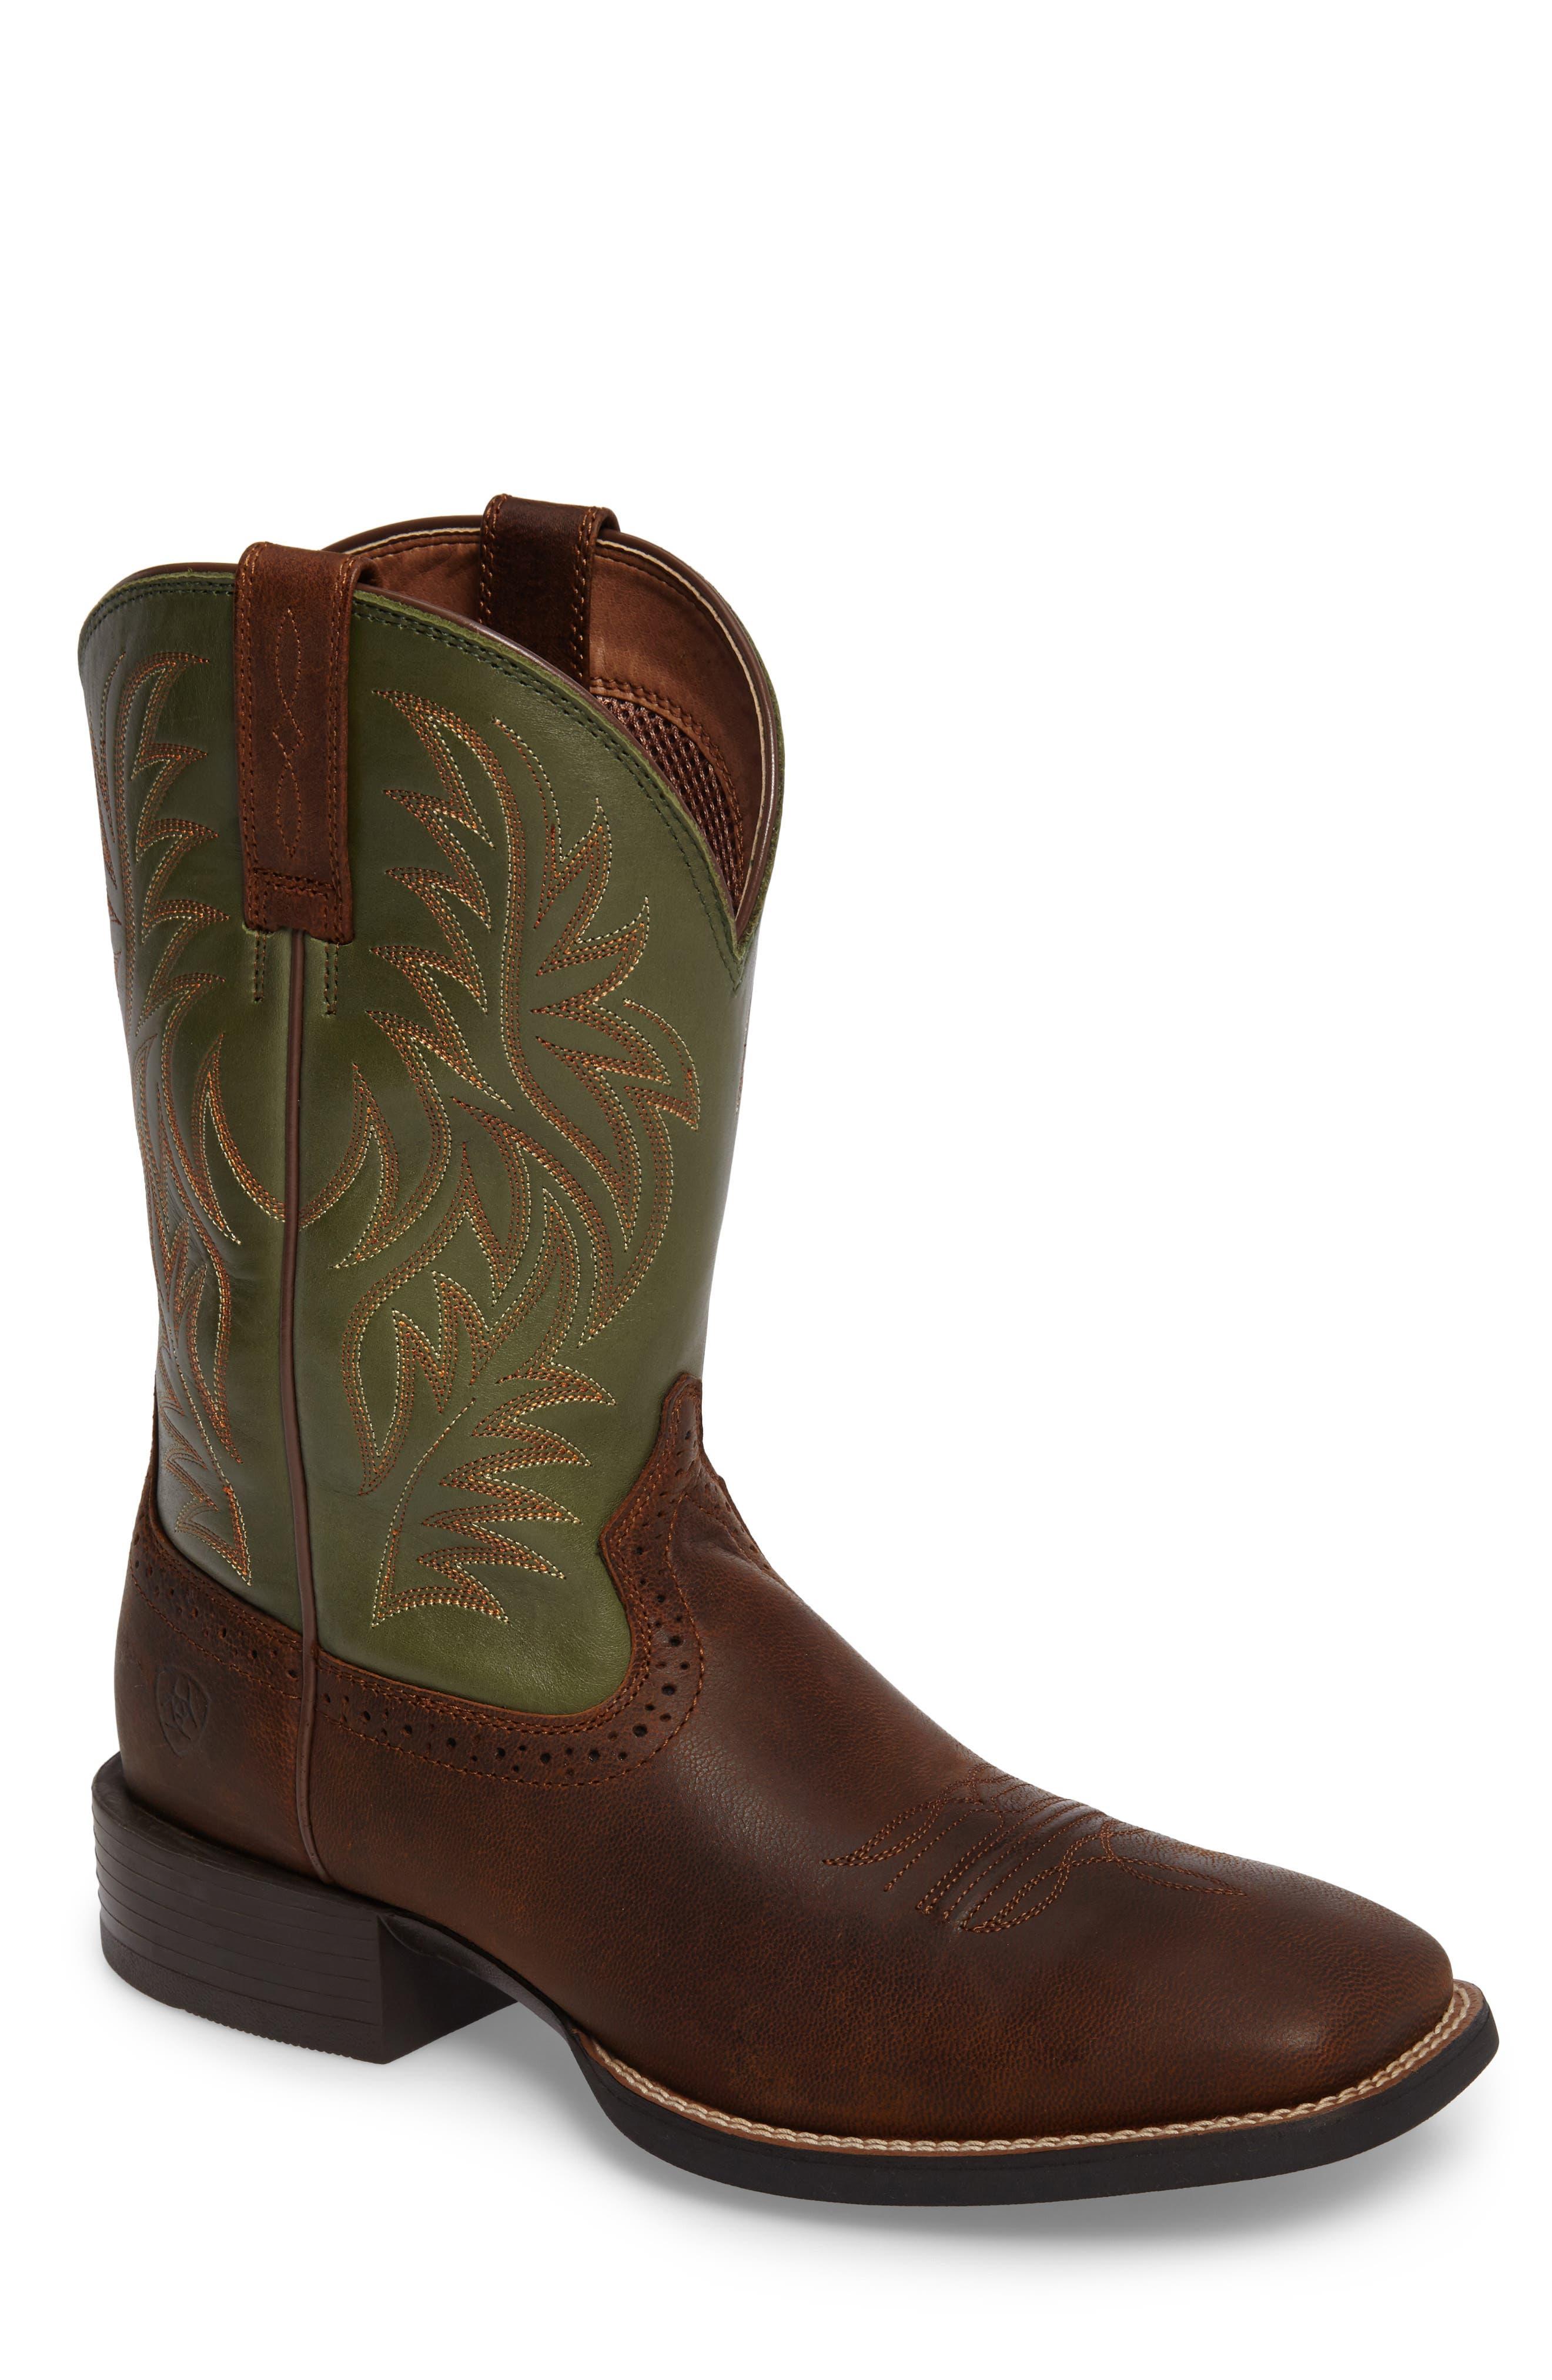 'Sport Western' Cowboy Boot,                             Main thumbnail 1, color,                             Tan/ Pesto